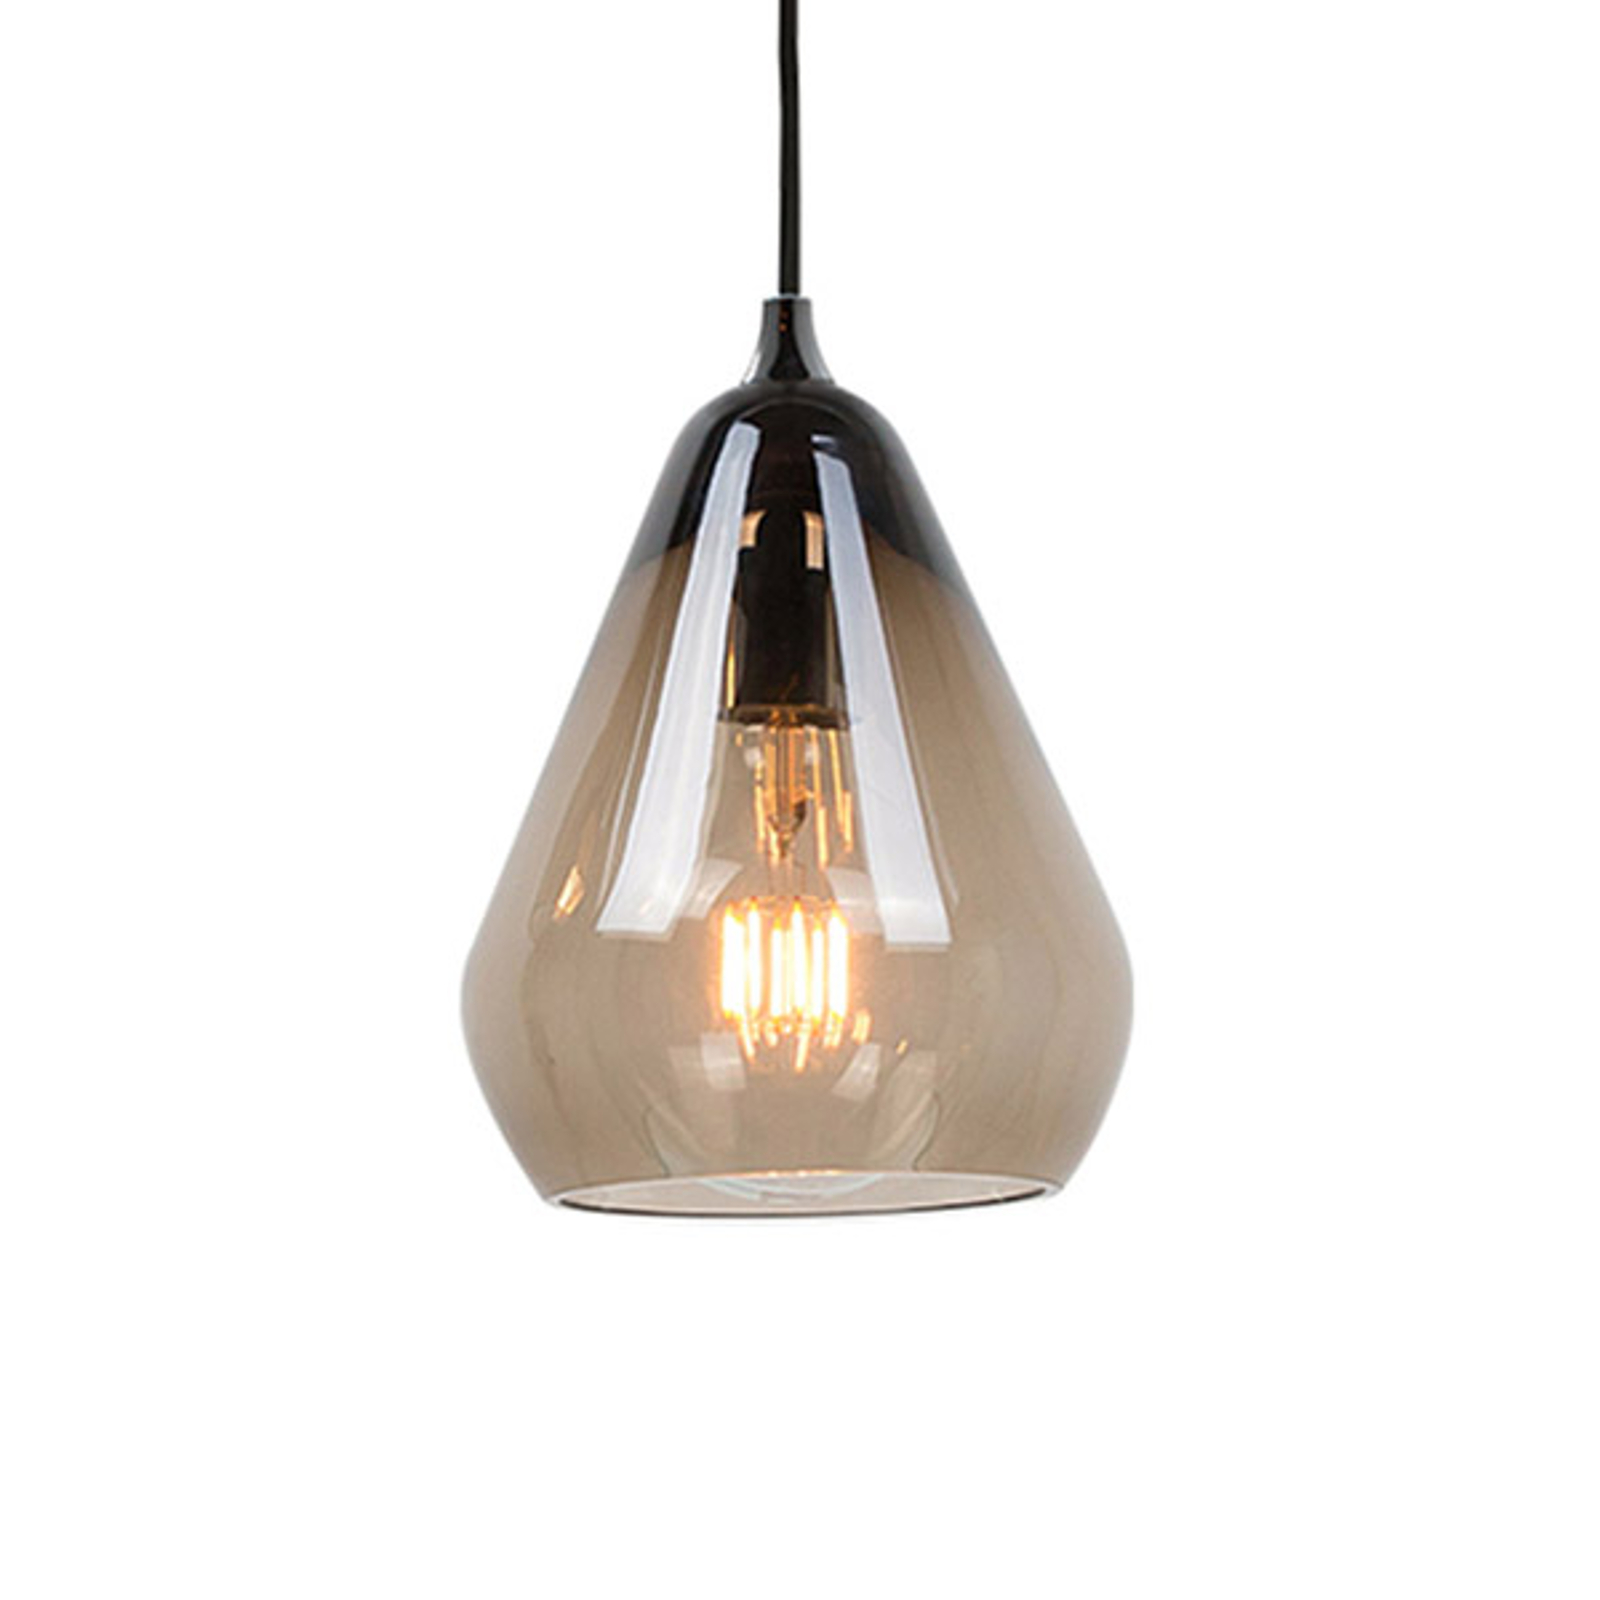 Innermost Core 20 - szklana lampa wisząca, szara